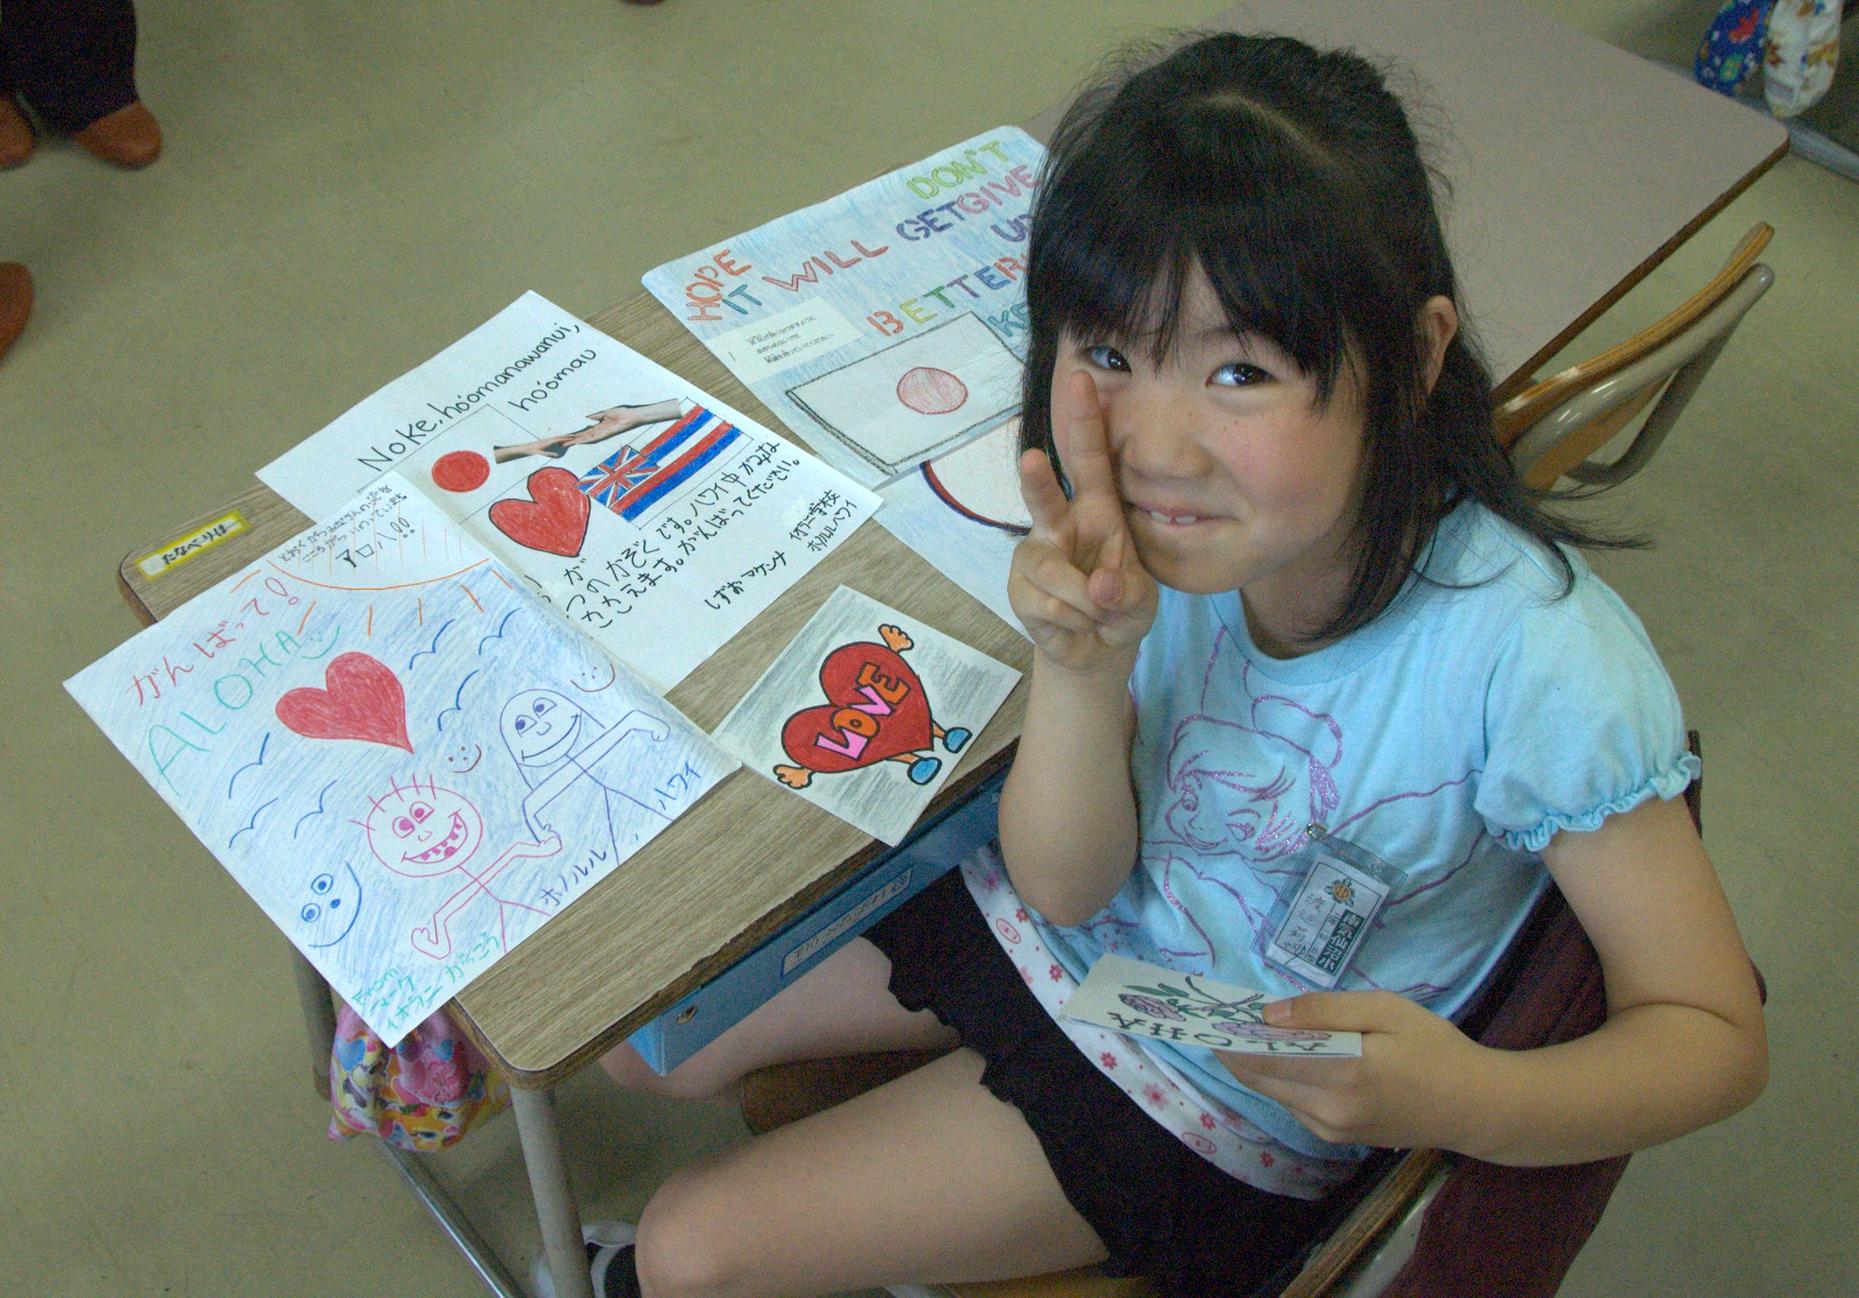 South Kessanuma School